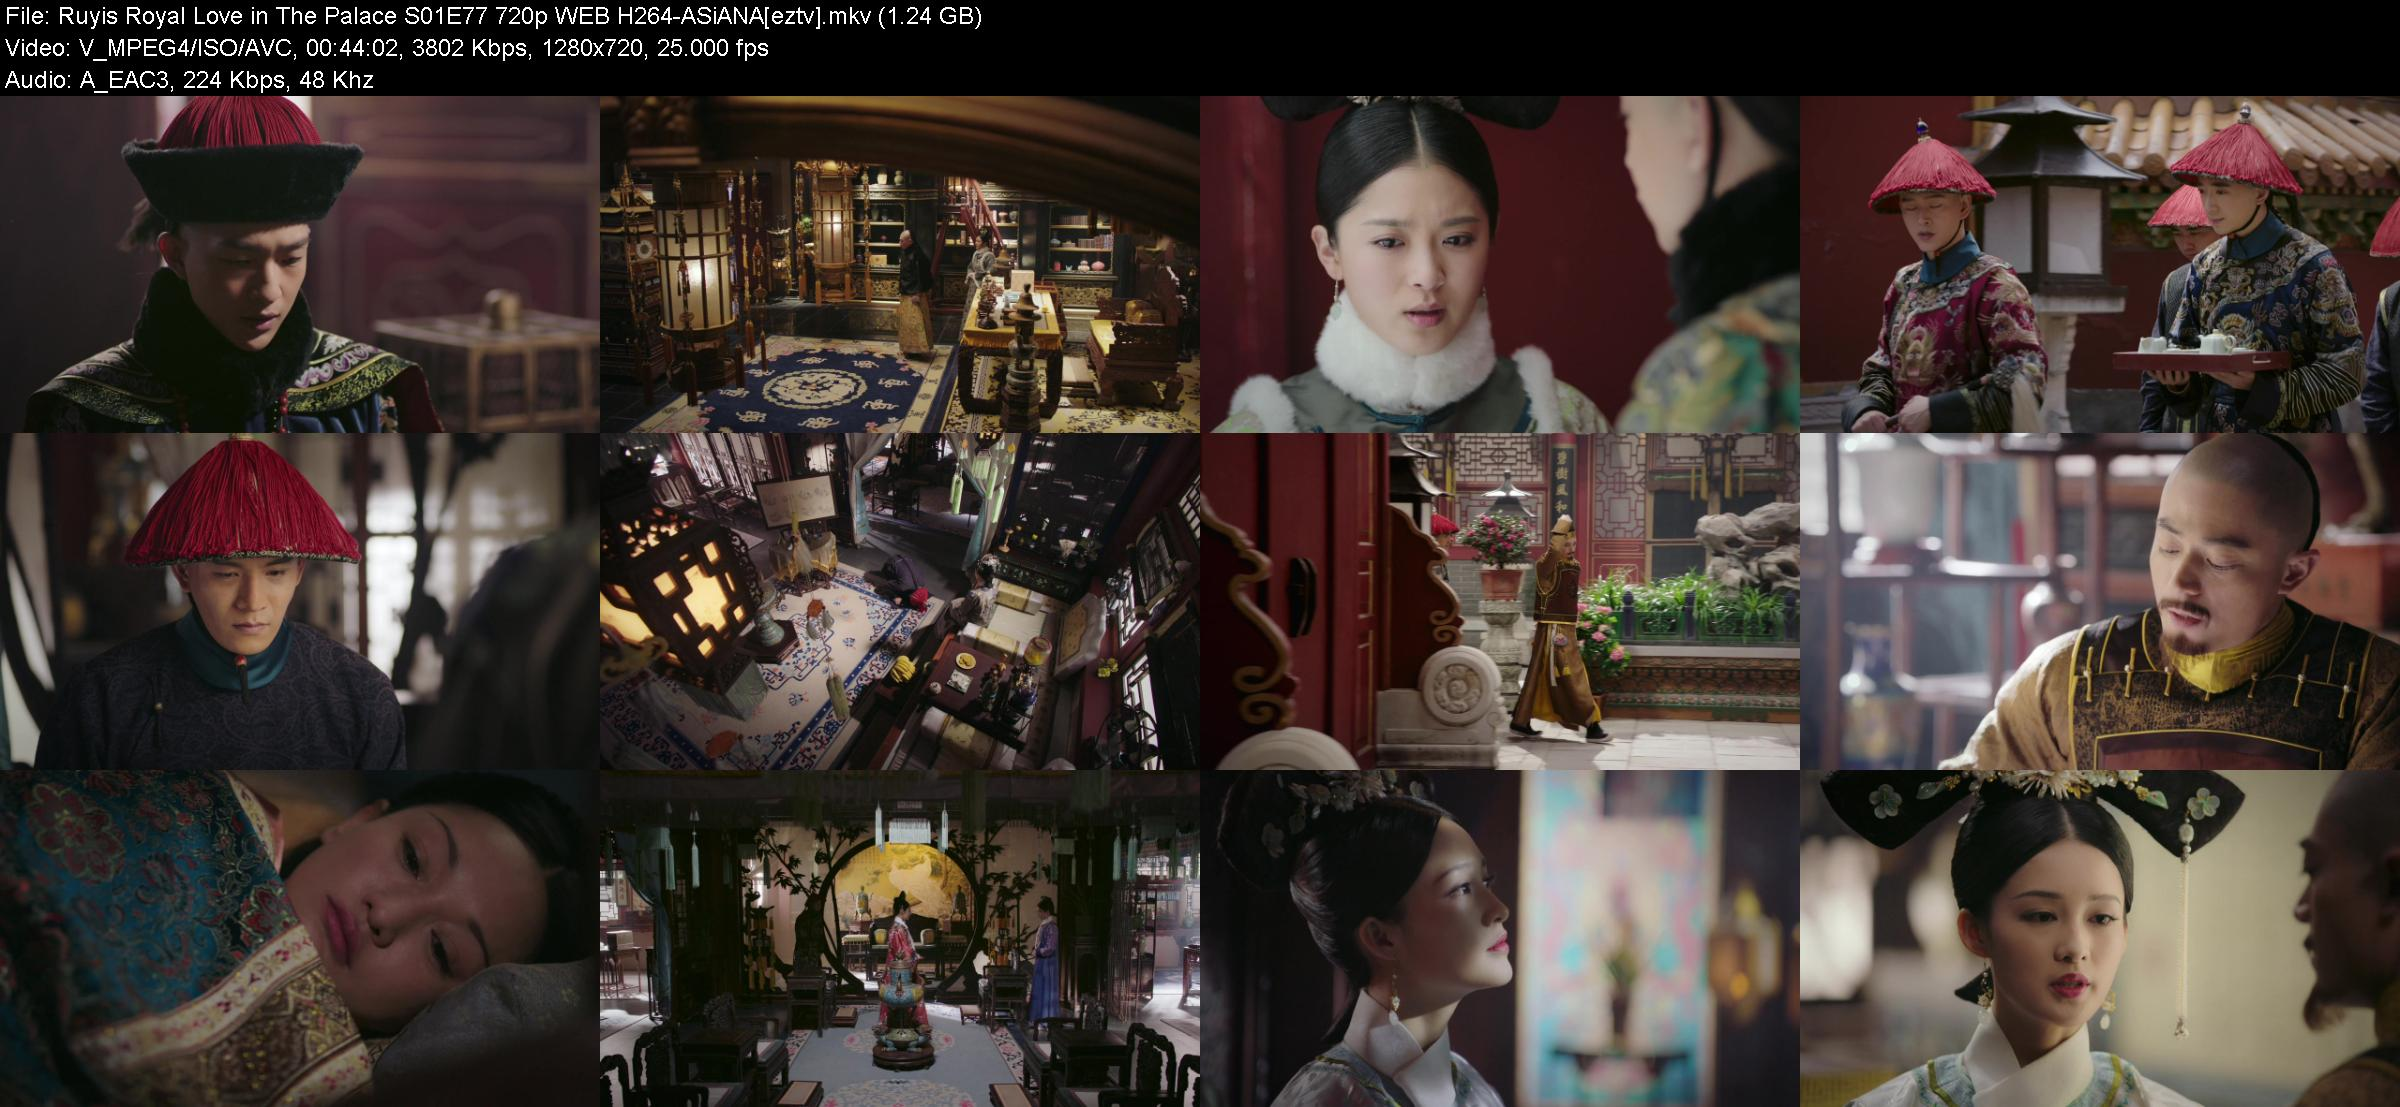 Ruyis Royal Love in The Palace S01E77 720p WEB H264-ASiANA